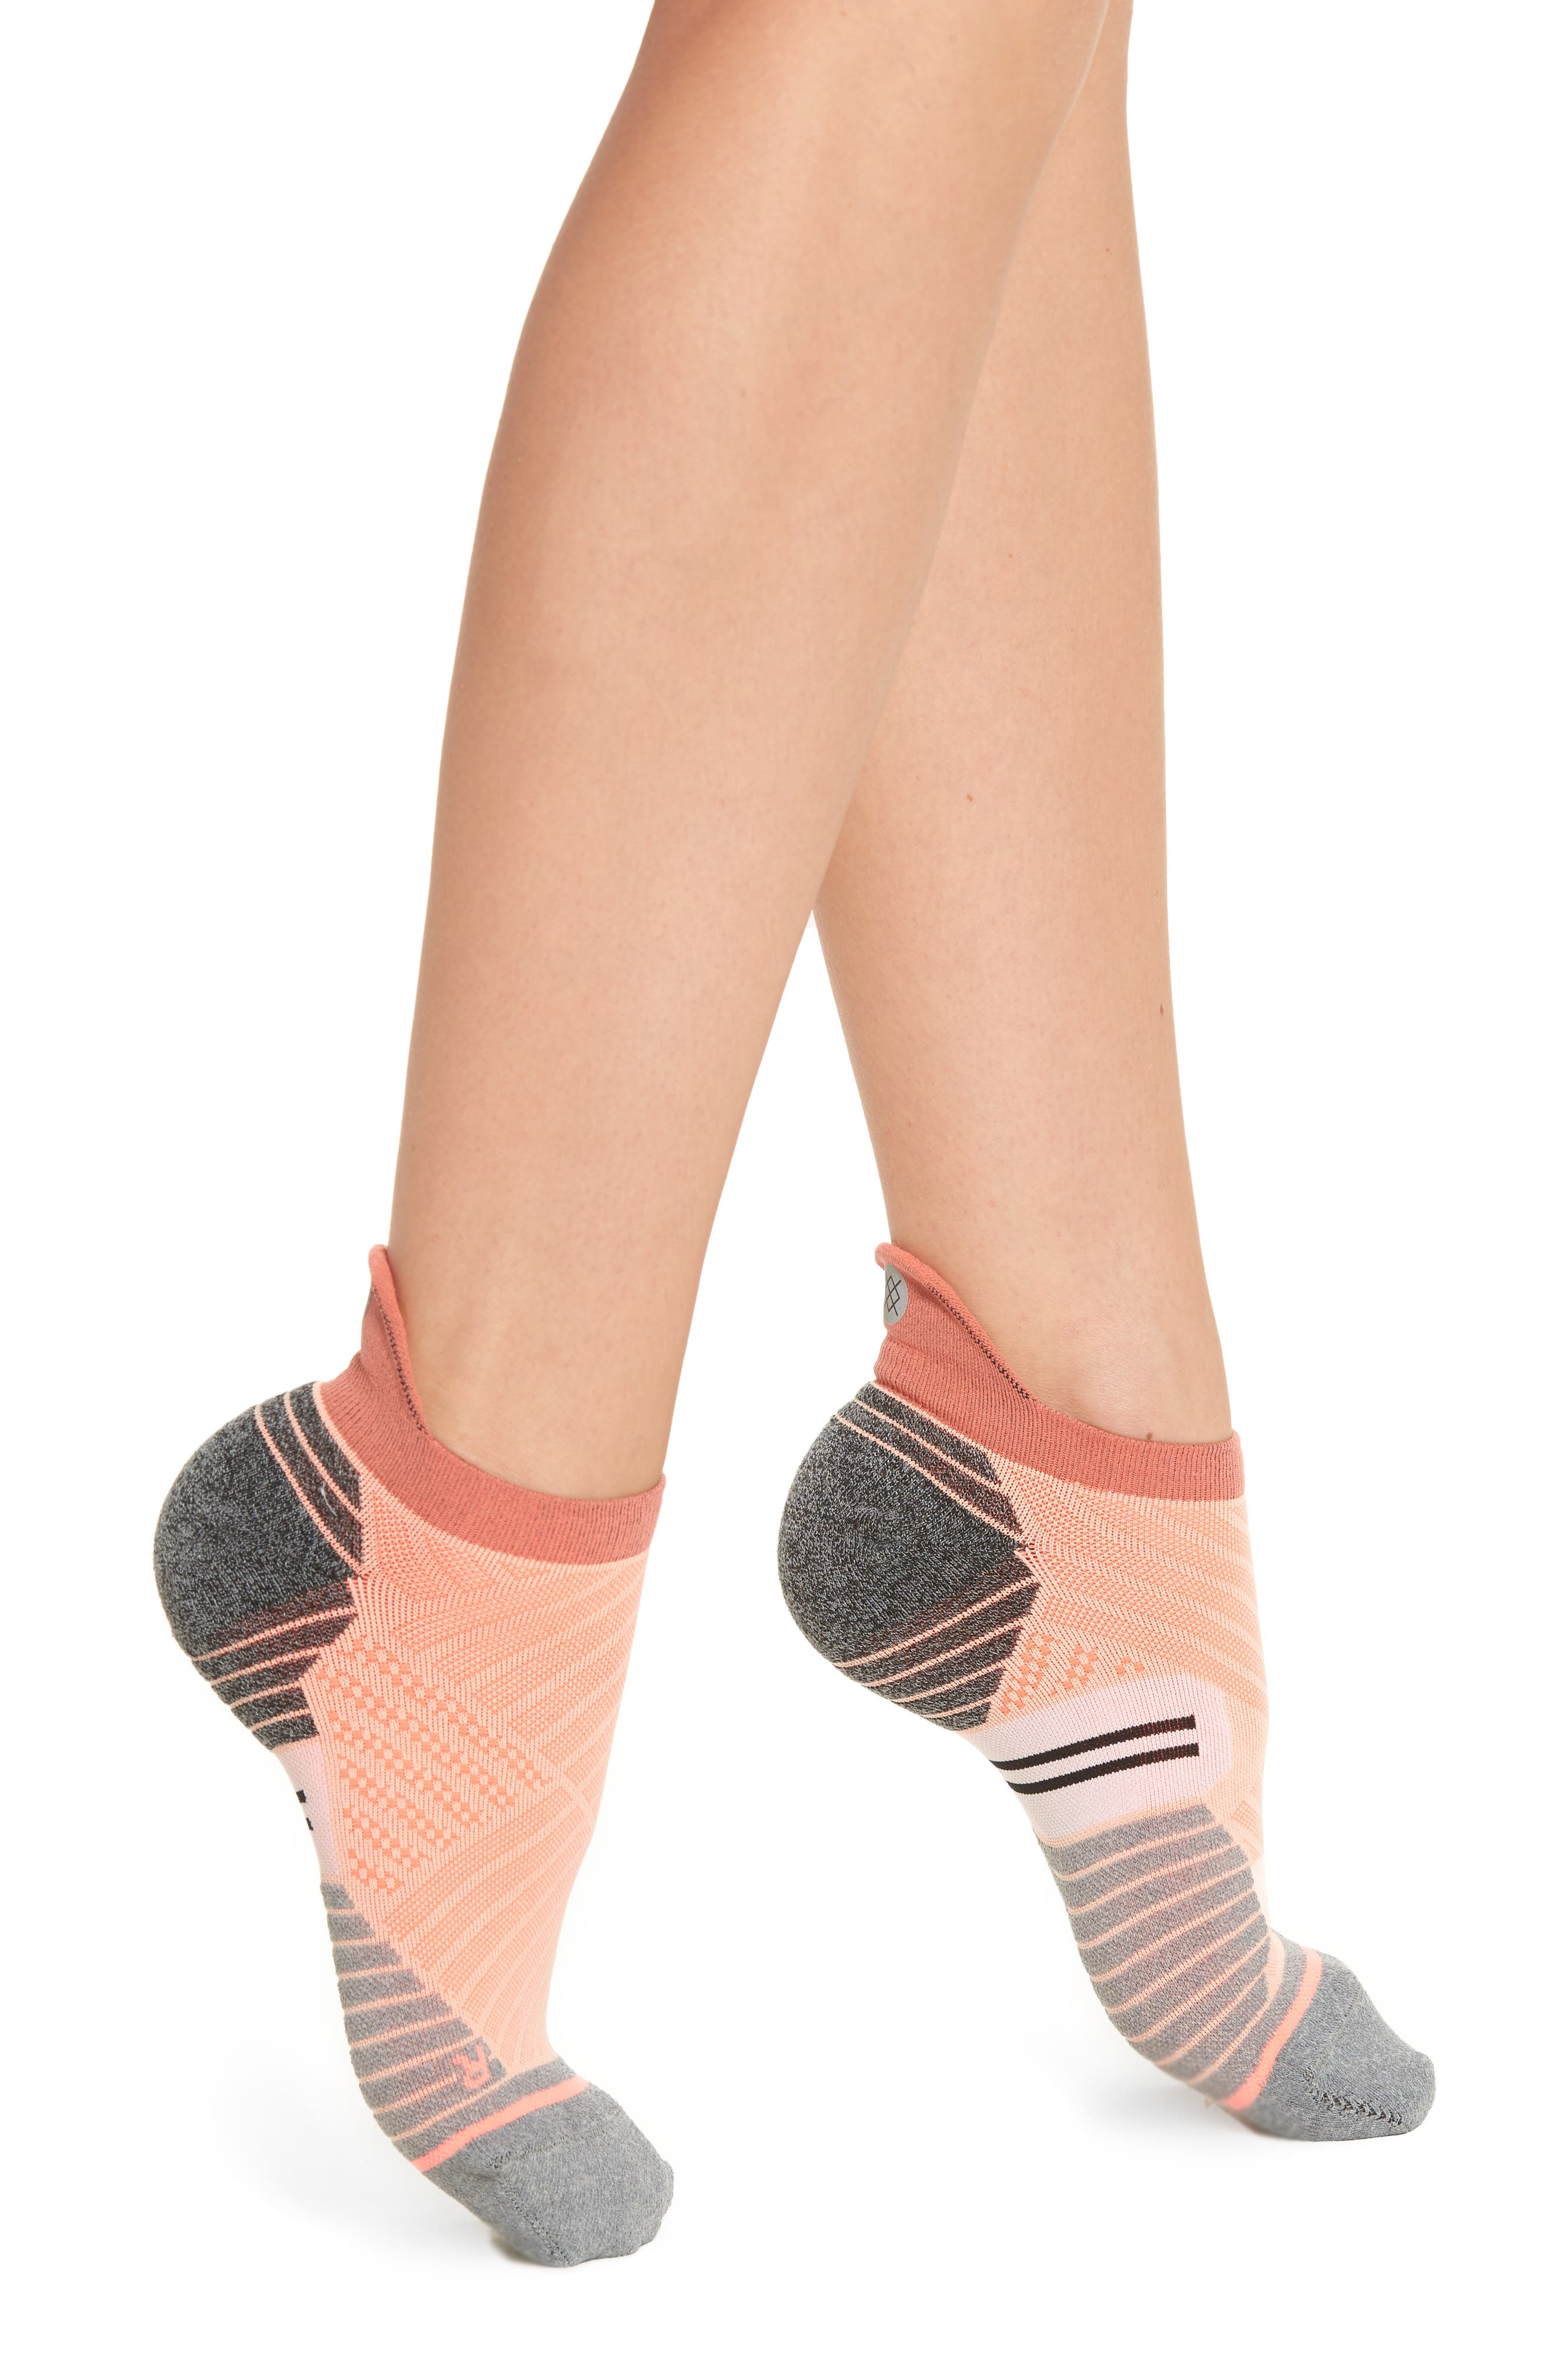 Valley Tab Running Socks,                             Main thumbnail 1, color,                             Peach